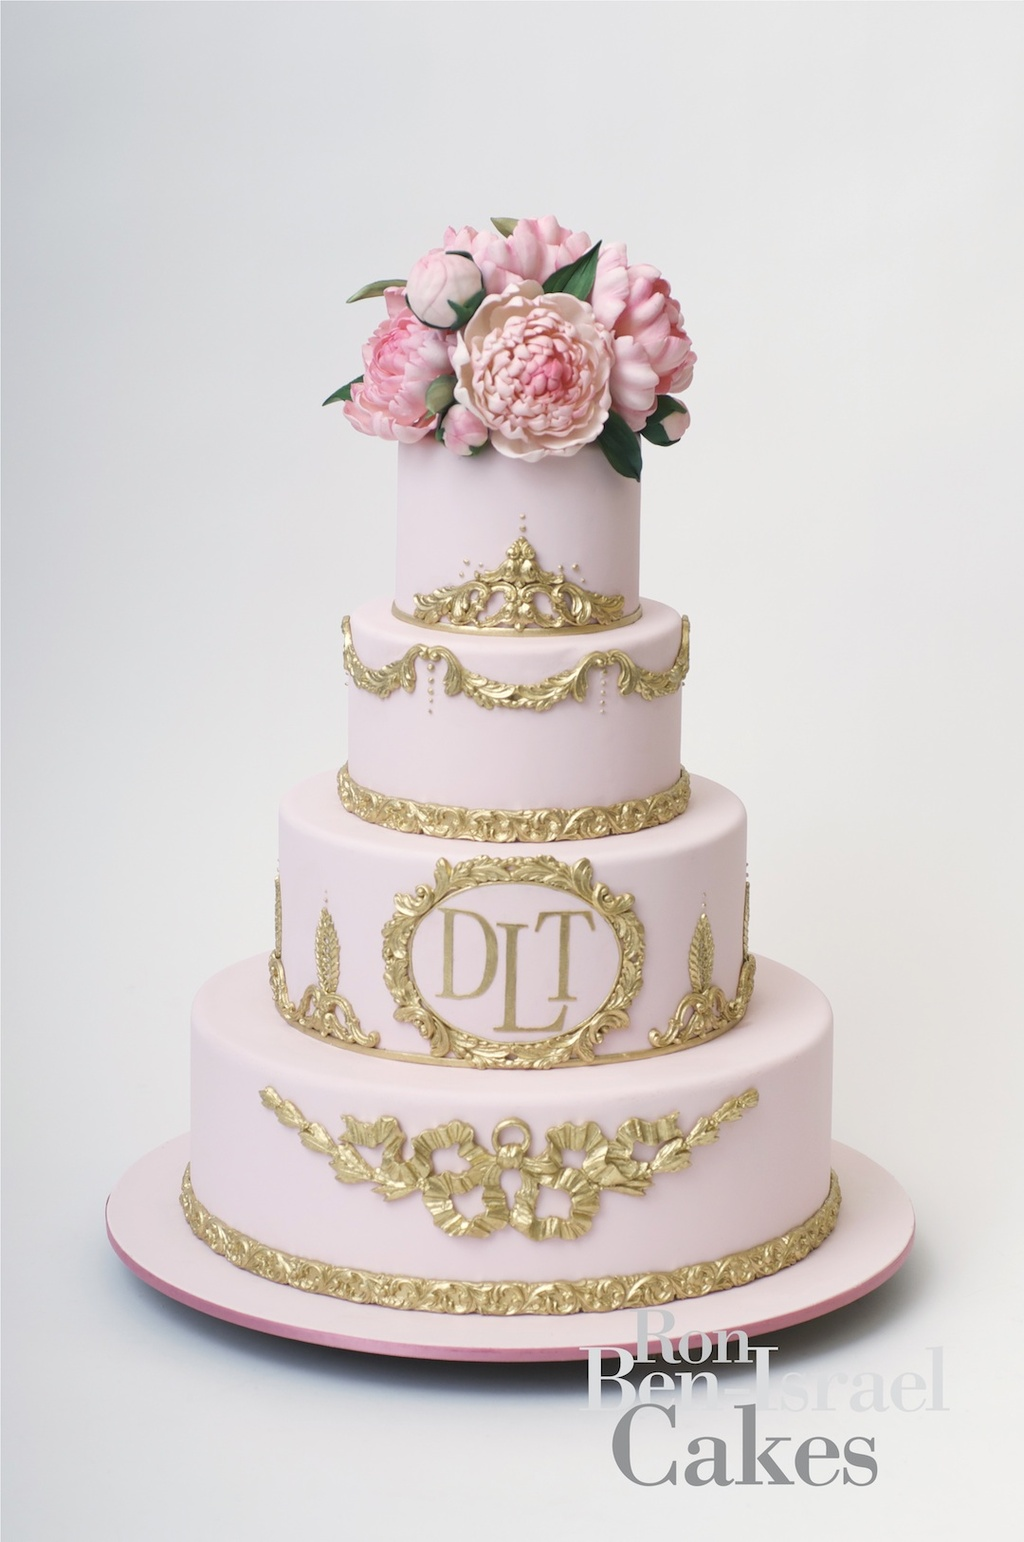 Wedding-cake-inspiration-ron-ben-isreal-wedding-cakes-light-pink-gold.full